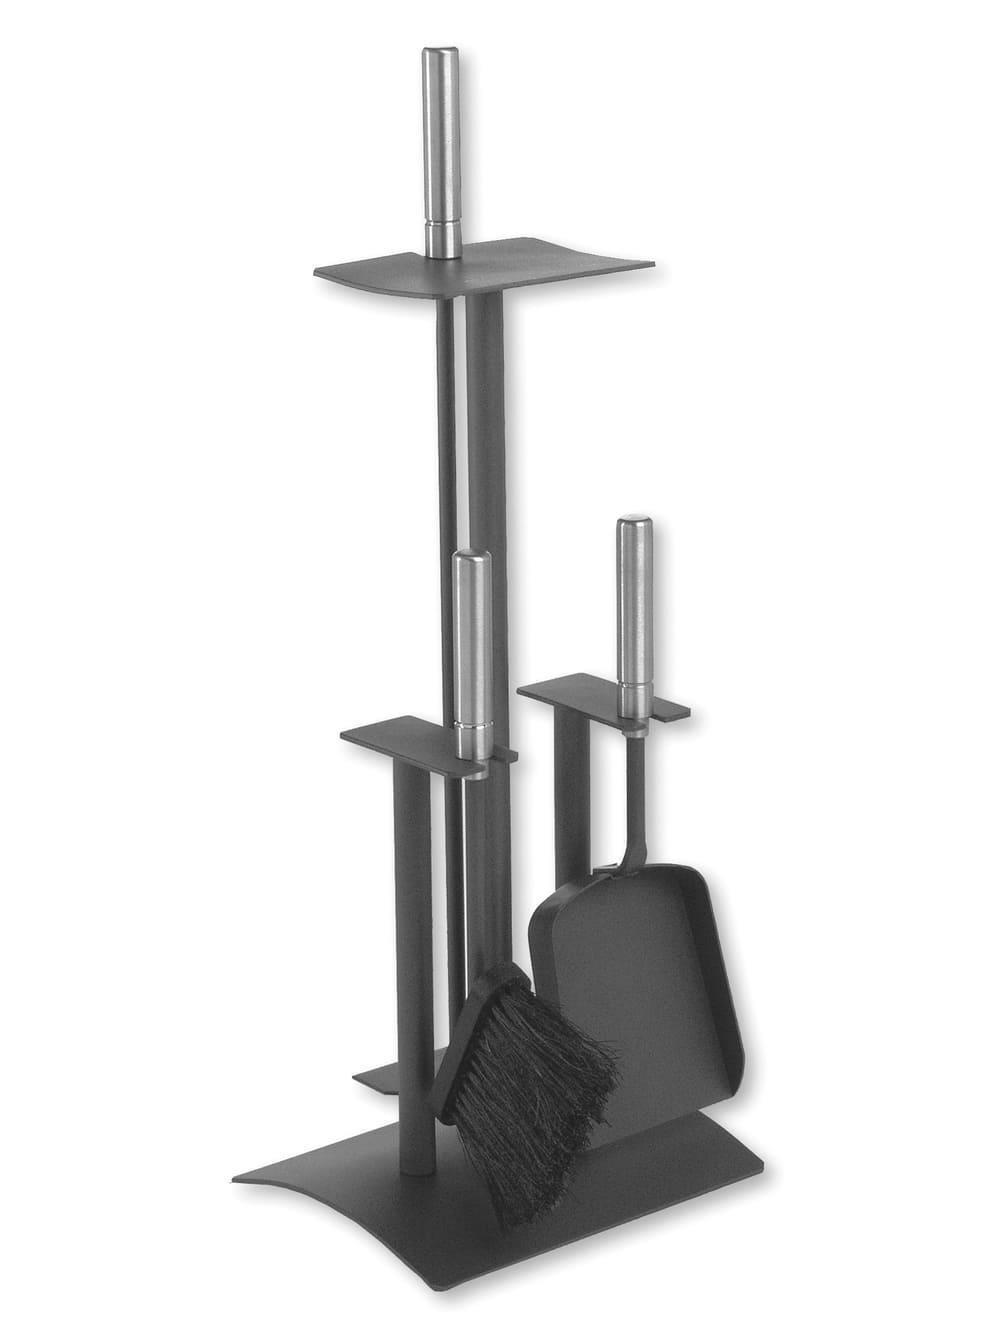 Kaminprofi24 Kaminbesteck Lienbacher Metall Anthrazit 4 Teilig Online Kaufen